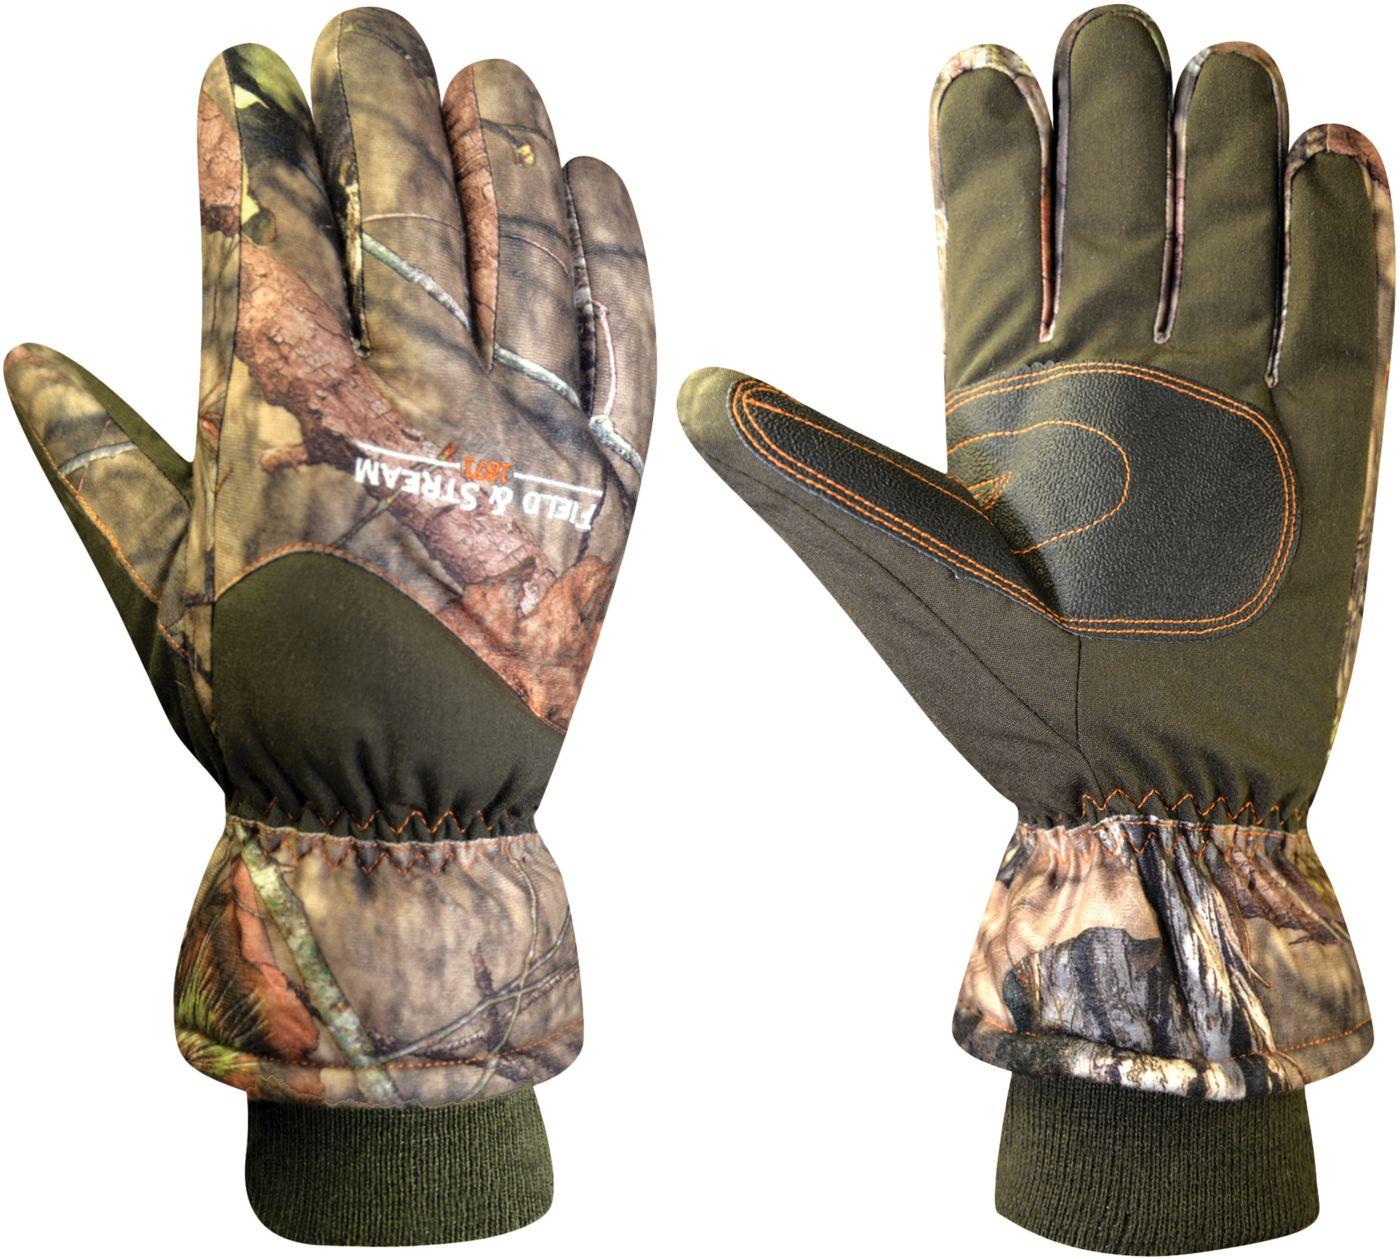 Field & Stream Men's True Pursuit Insulated Hunting Gloves